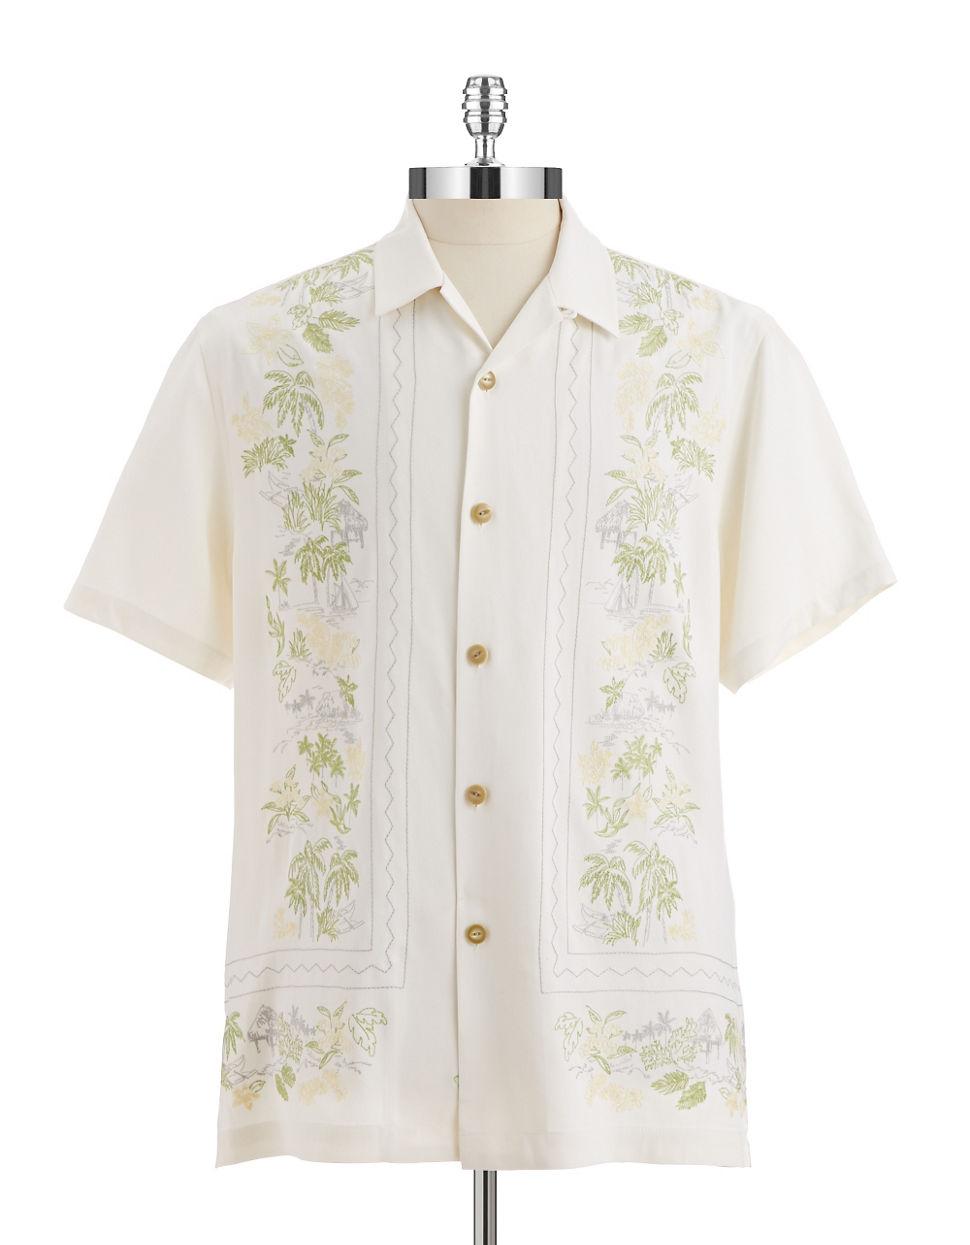 Tommy Bahama Silk Hawaiin Sportshirt In White For Men